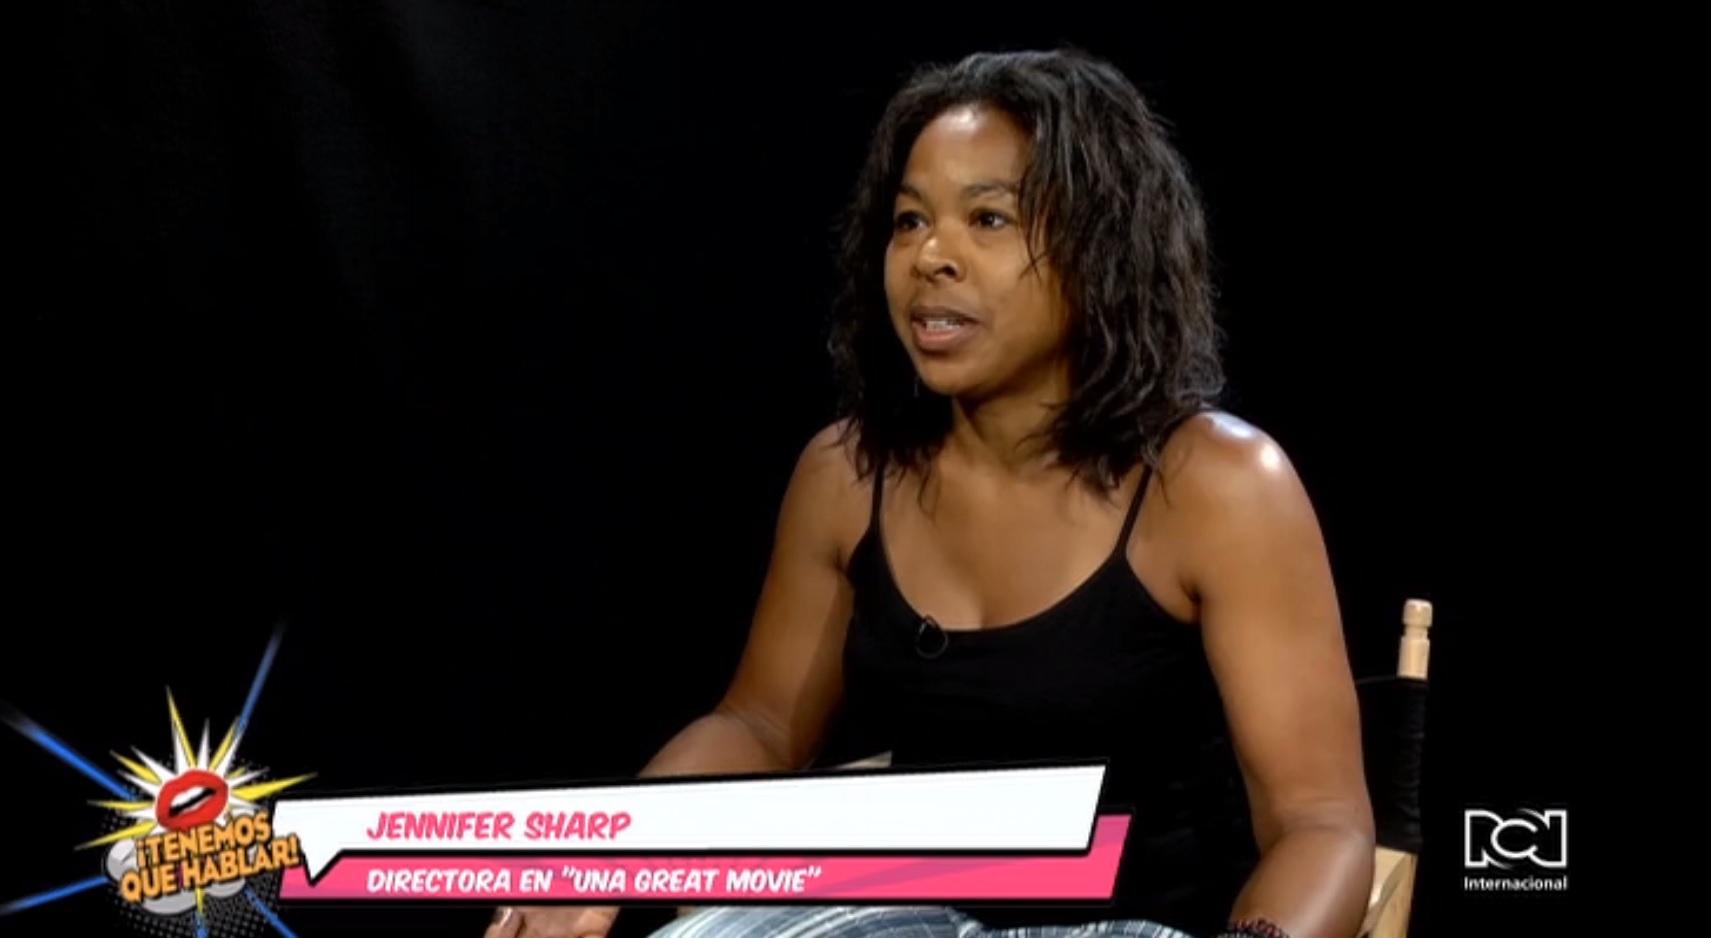 Jennifer Sharp reveló los sacrificios que hizo para realizar el filme 'Una gran movie'